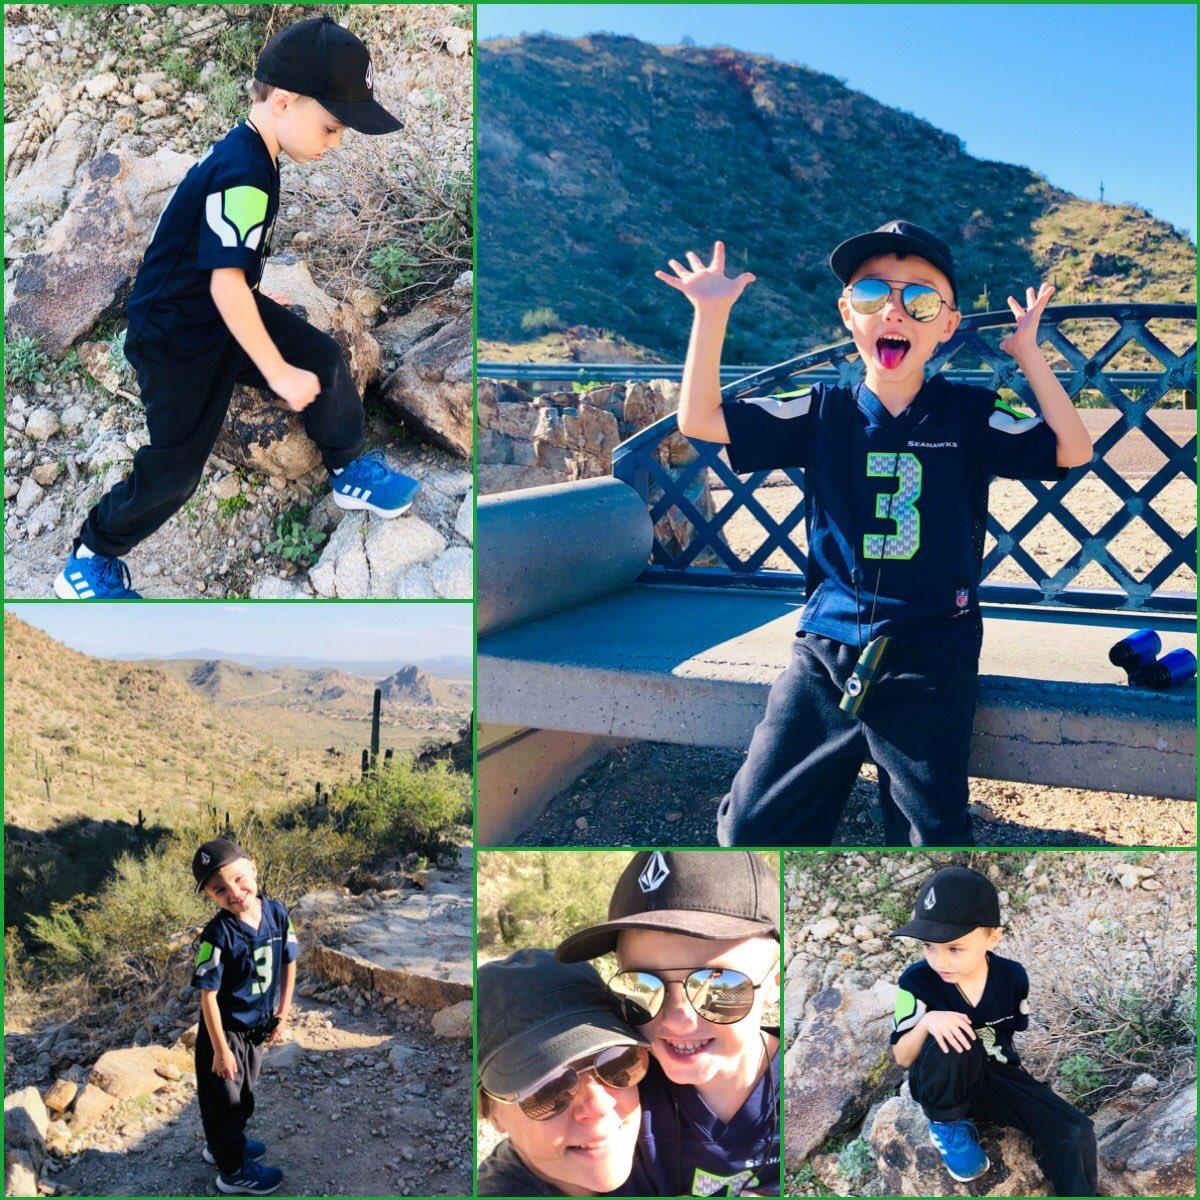 Sweet memory today with my little guy- hiking together just the two of us#hikingadventures #hiking #AZ #phoenix #SundayFundaypic.twitter.com/pEya8vgblI – At Telegraph Pass Trailhead